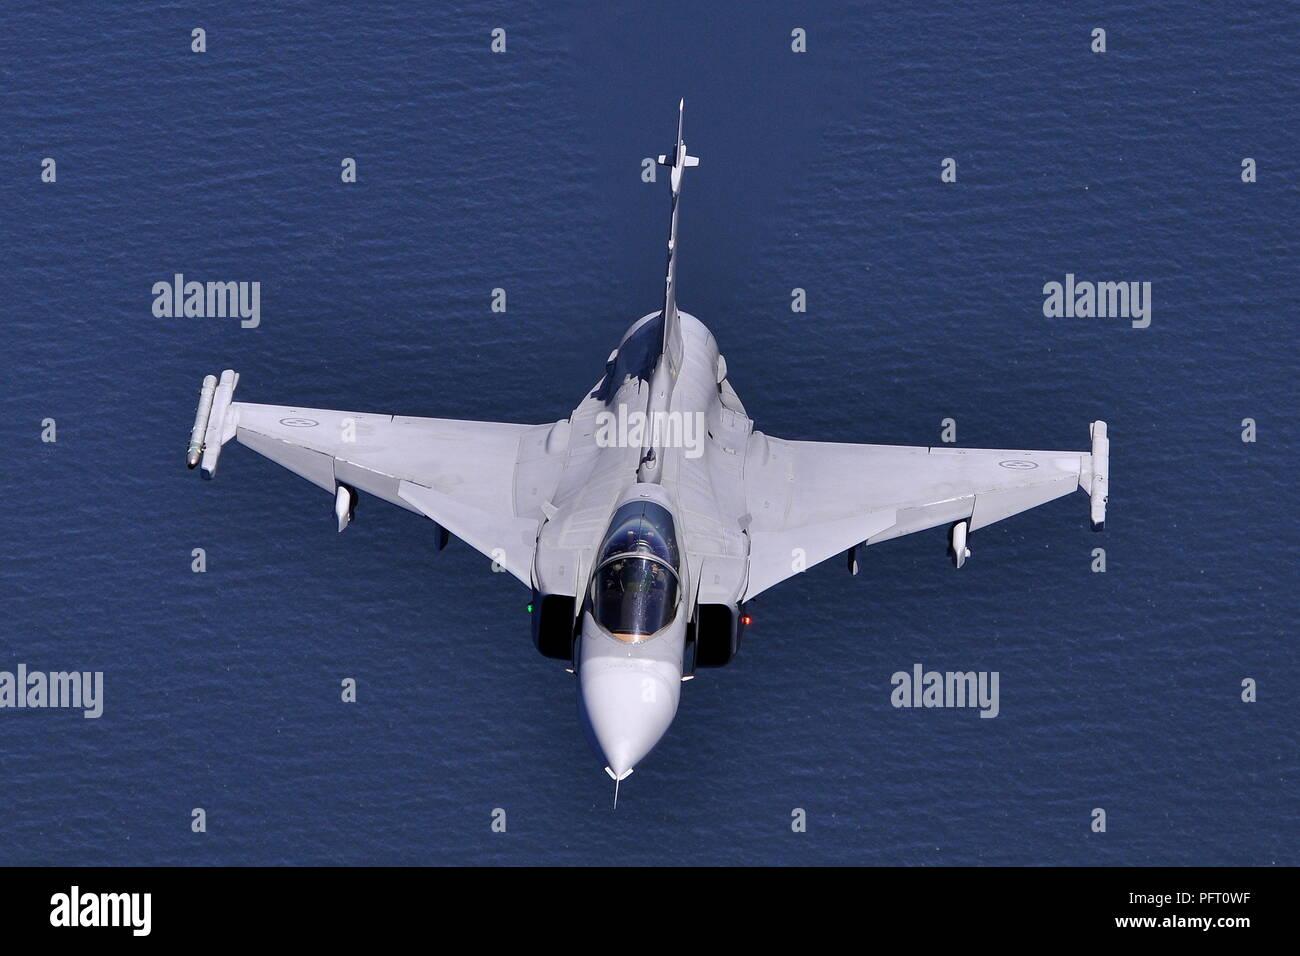 SAAB JAS-39C 39220 OF F7 WING SWEDISH AIR FORCE. - Stock Image